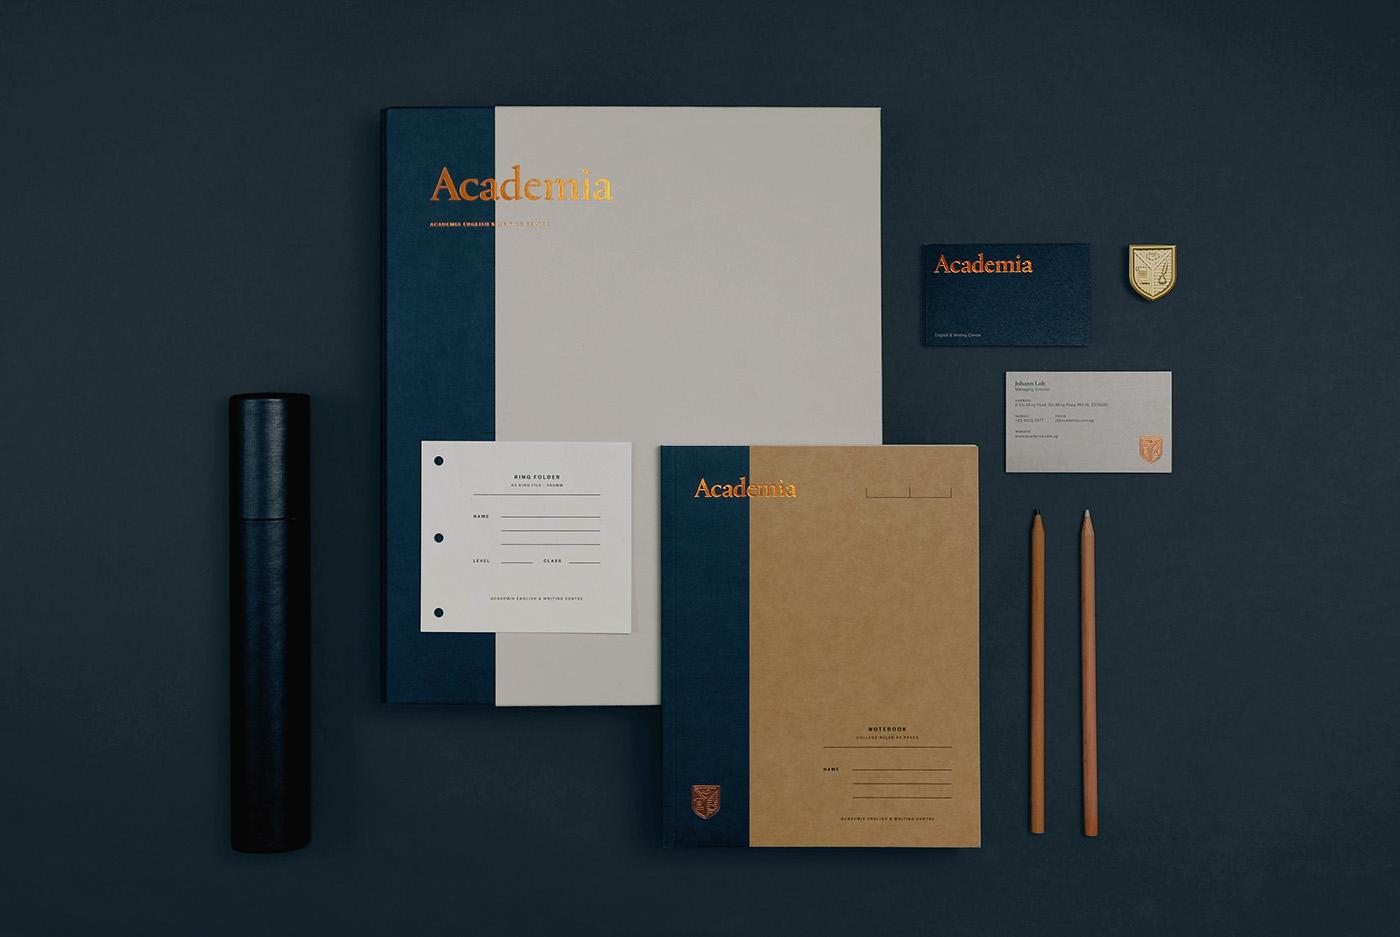 Classic prestige Education institution minimalist